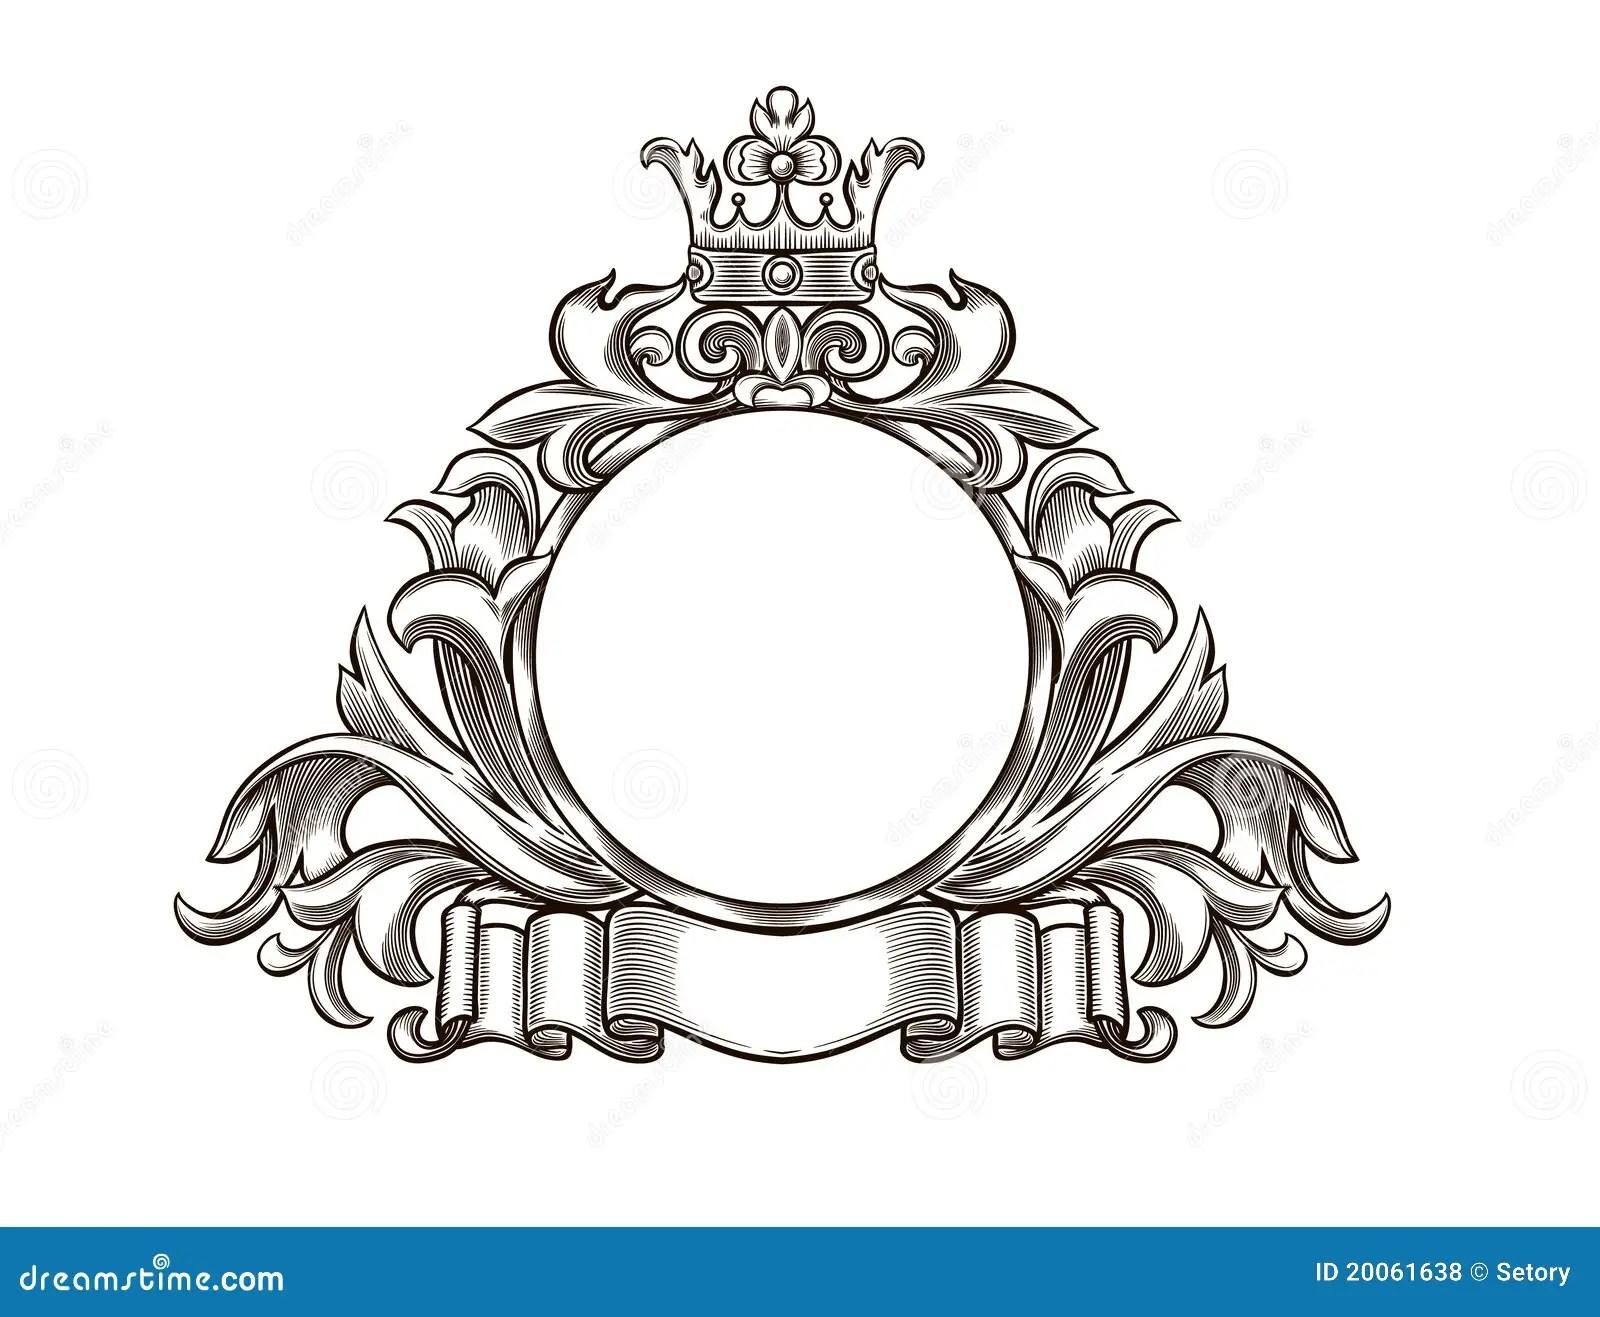 Black And White Emblem Royalty Free Stock Photos